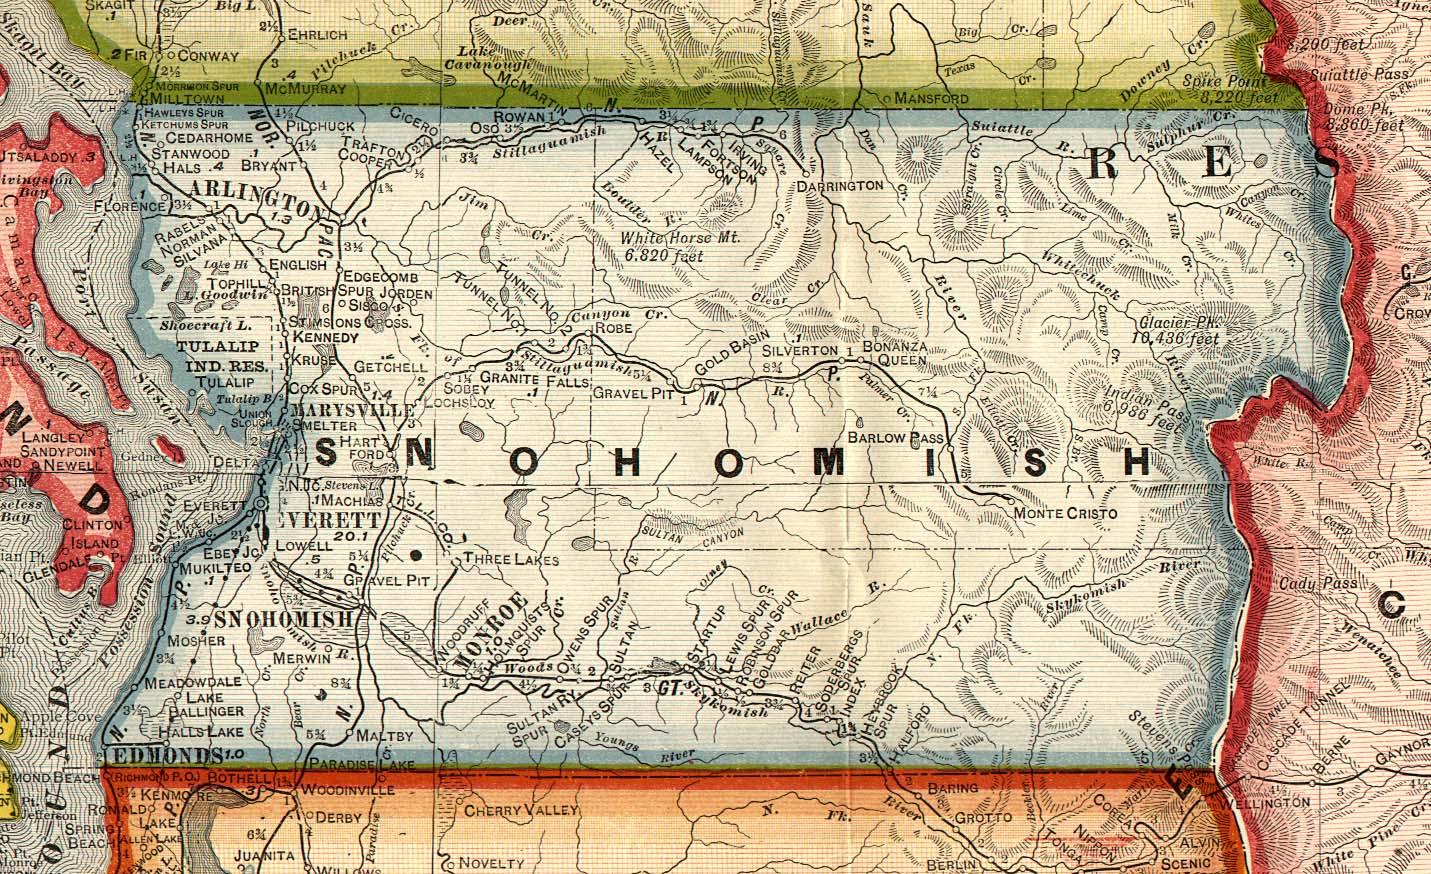 snohomish county washington map Snohomish County Washington 1909 Map Mappery